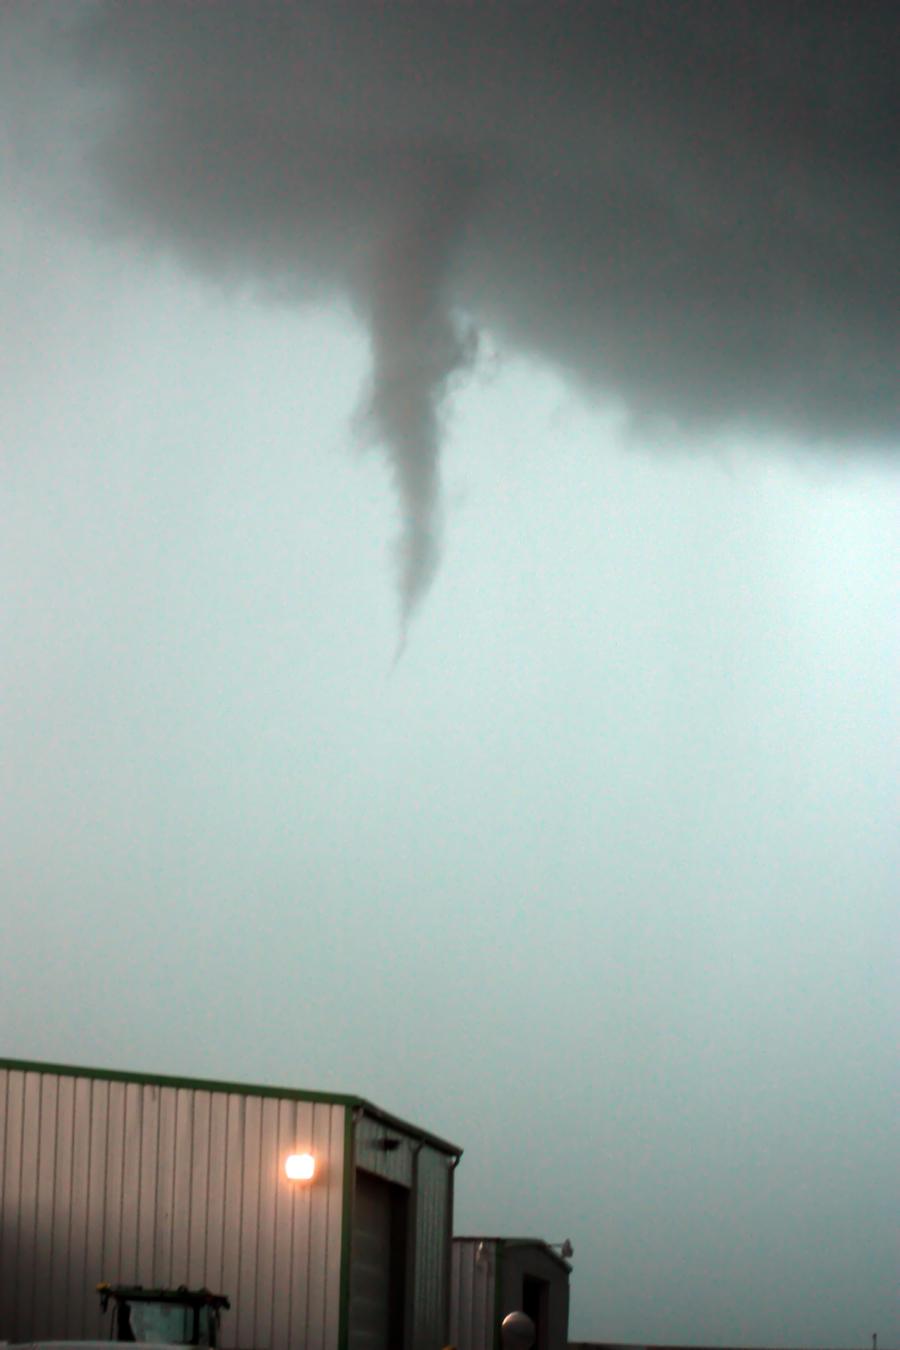 Image Gallery Tornado Forming - 157.4KB